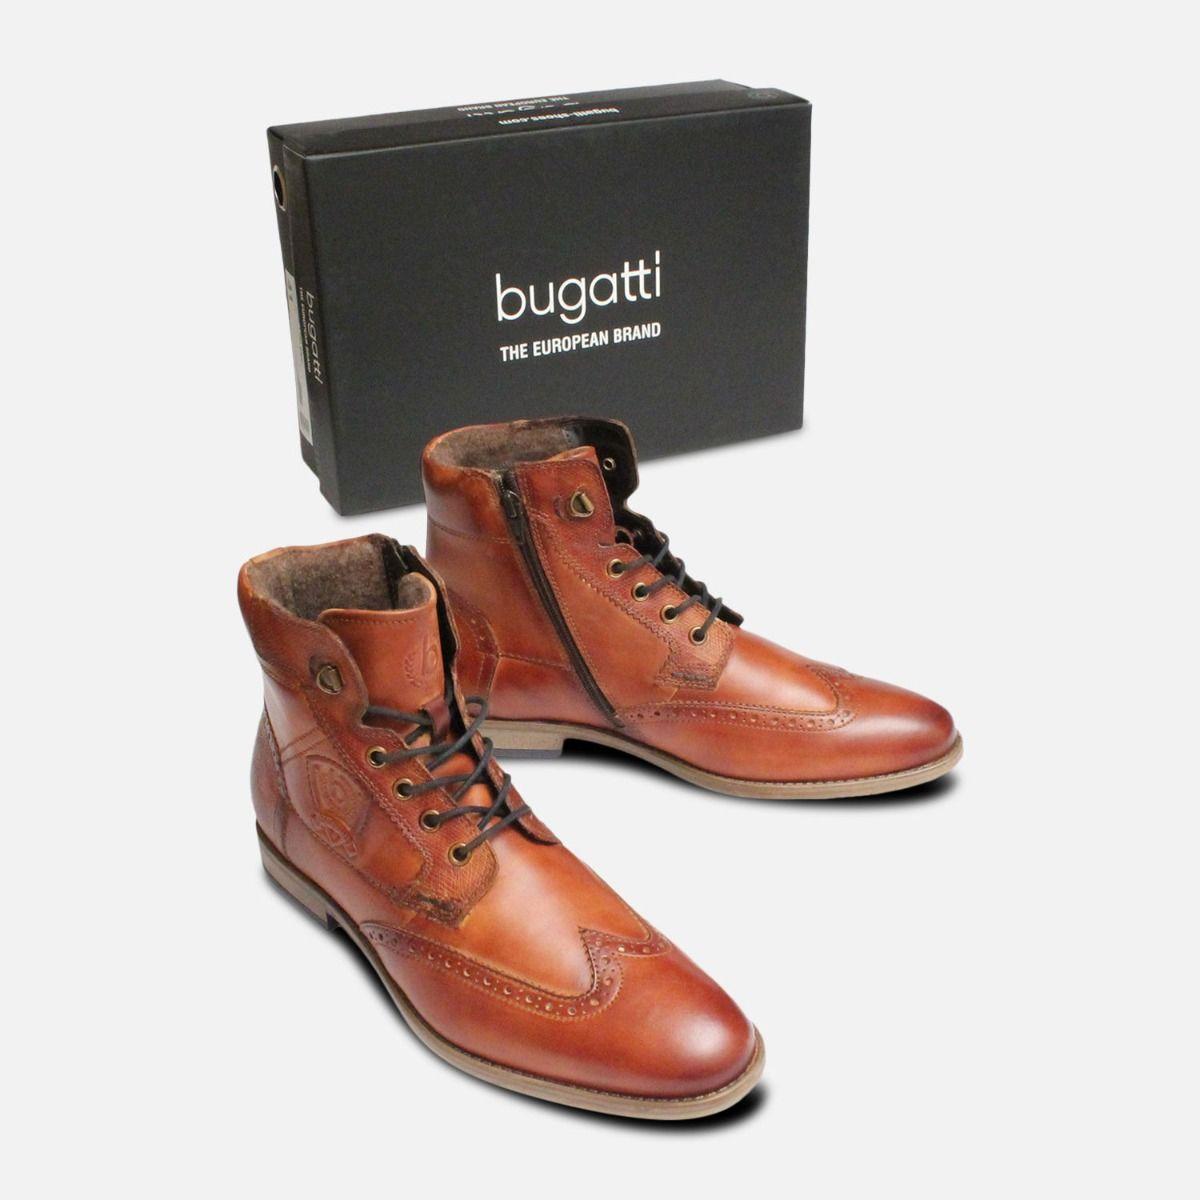 Commander Bugatti High Boots in Antique Tan